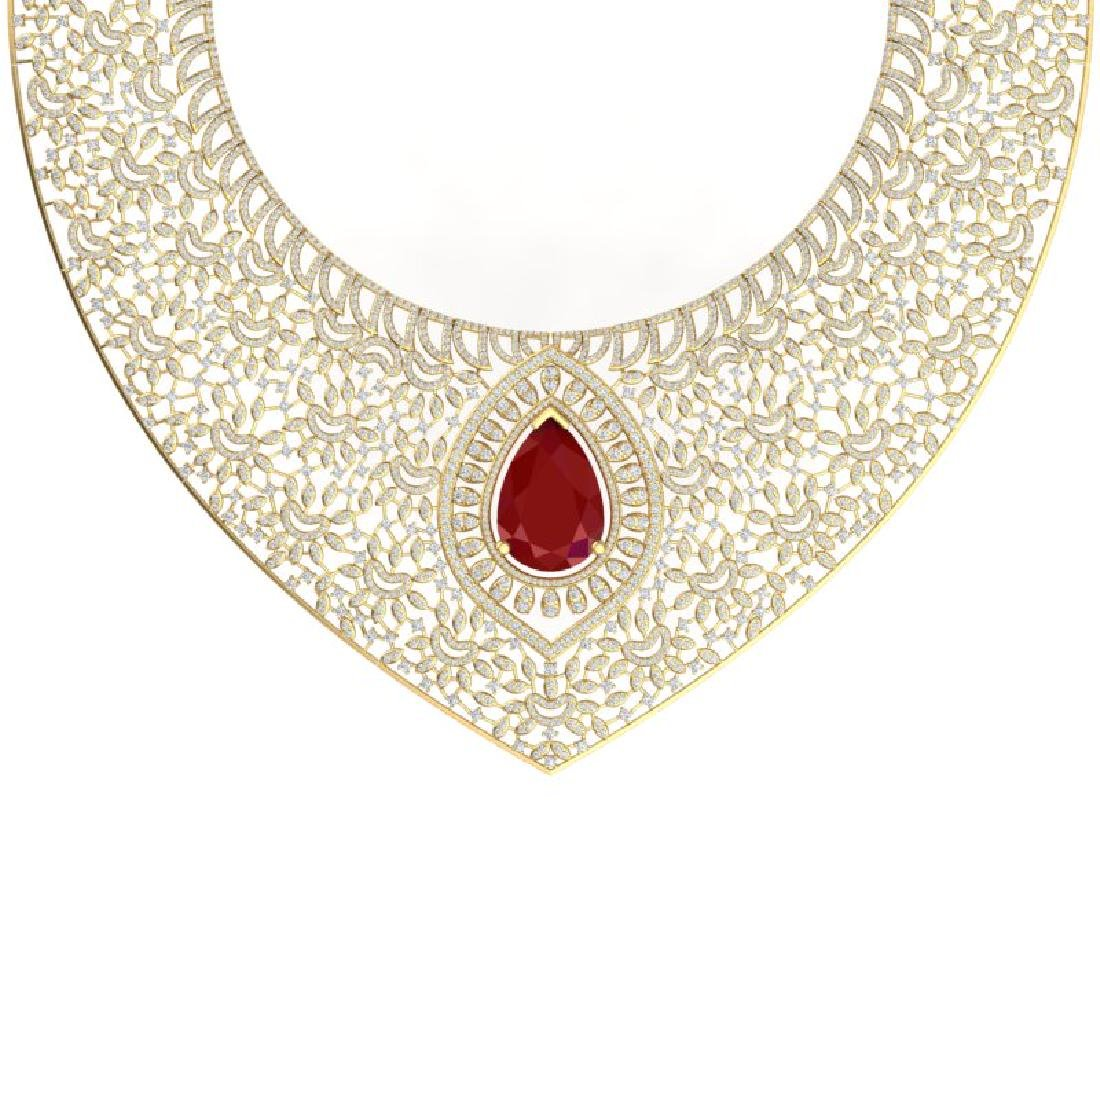 63.93 CTW Royalty Ruby & VS Diamond Necklace 18K Yellow - 2